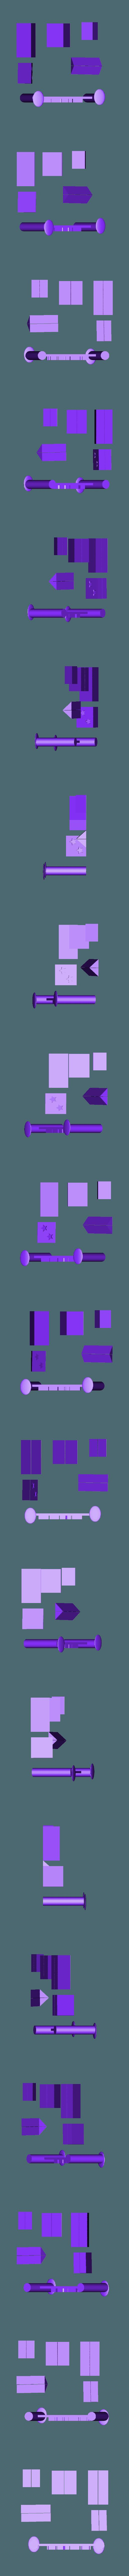 campement.stl Download free STL file camp • 3D printing object, buzz-blob